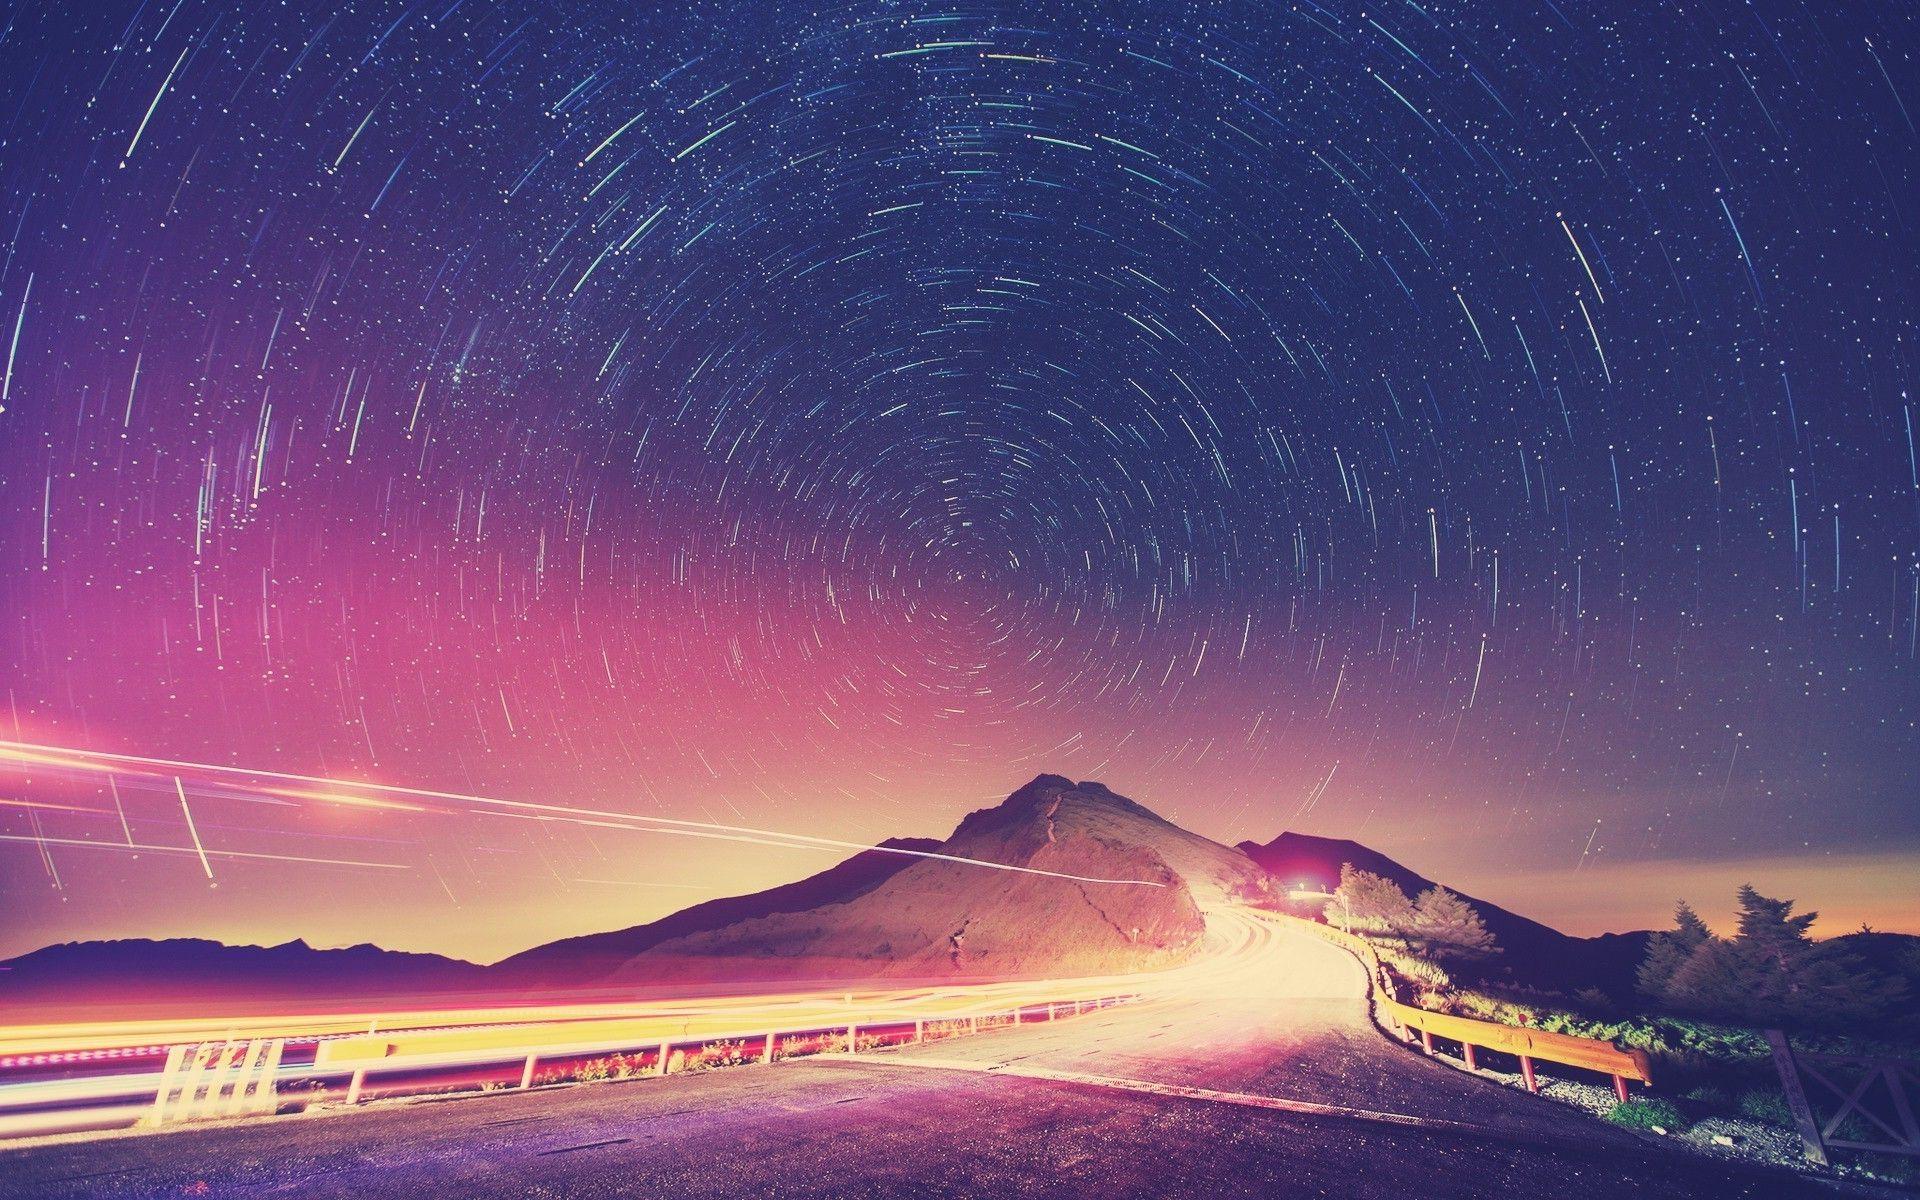 Stars Night Sky Wallpapers Group 72